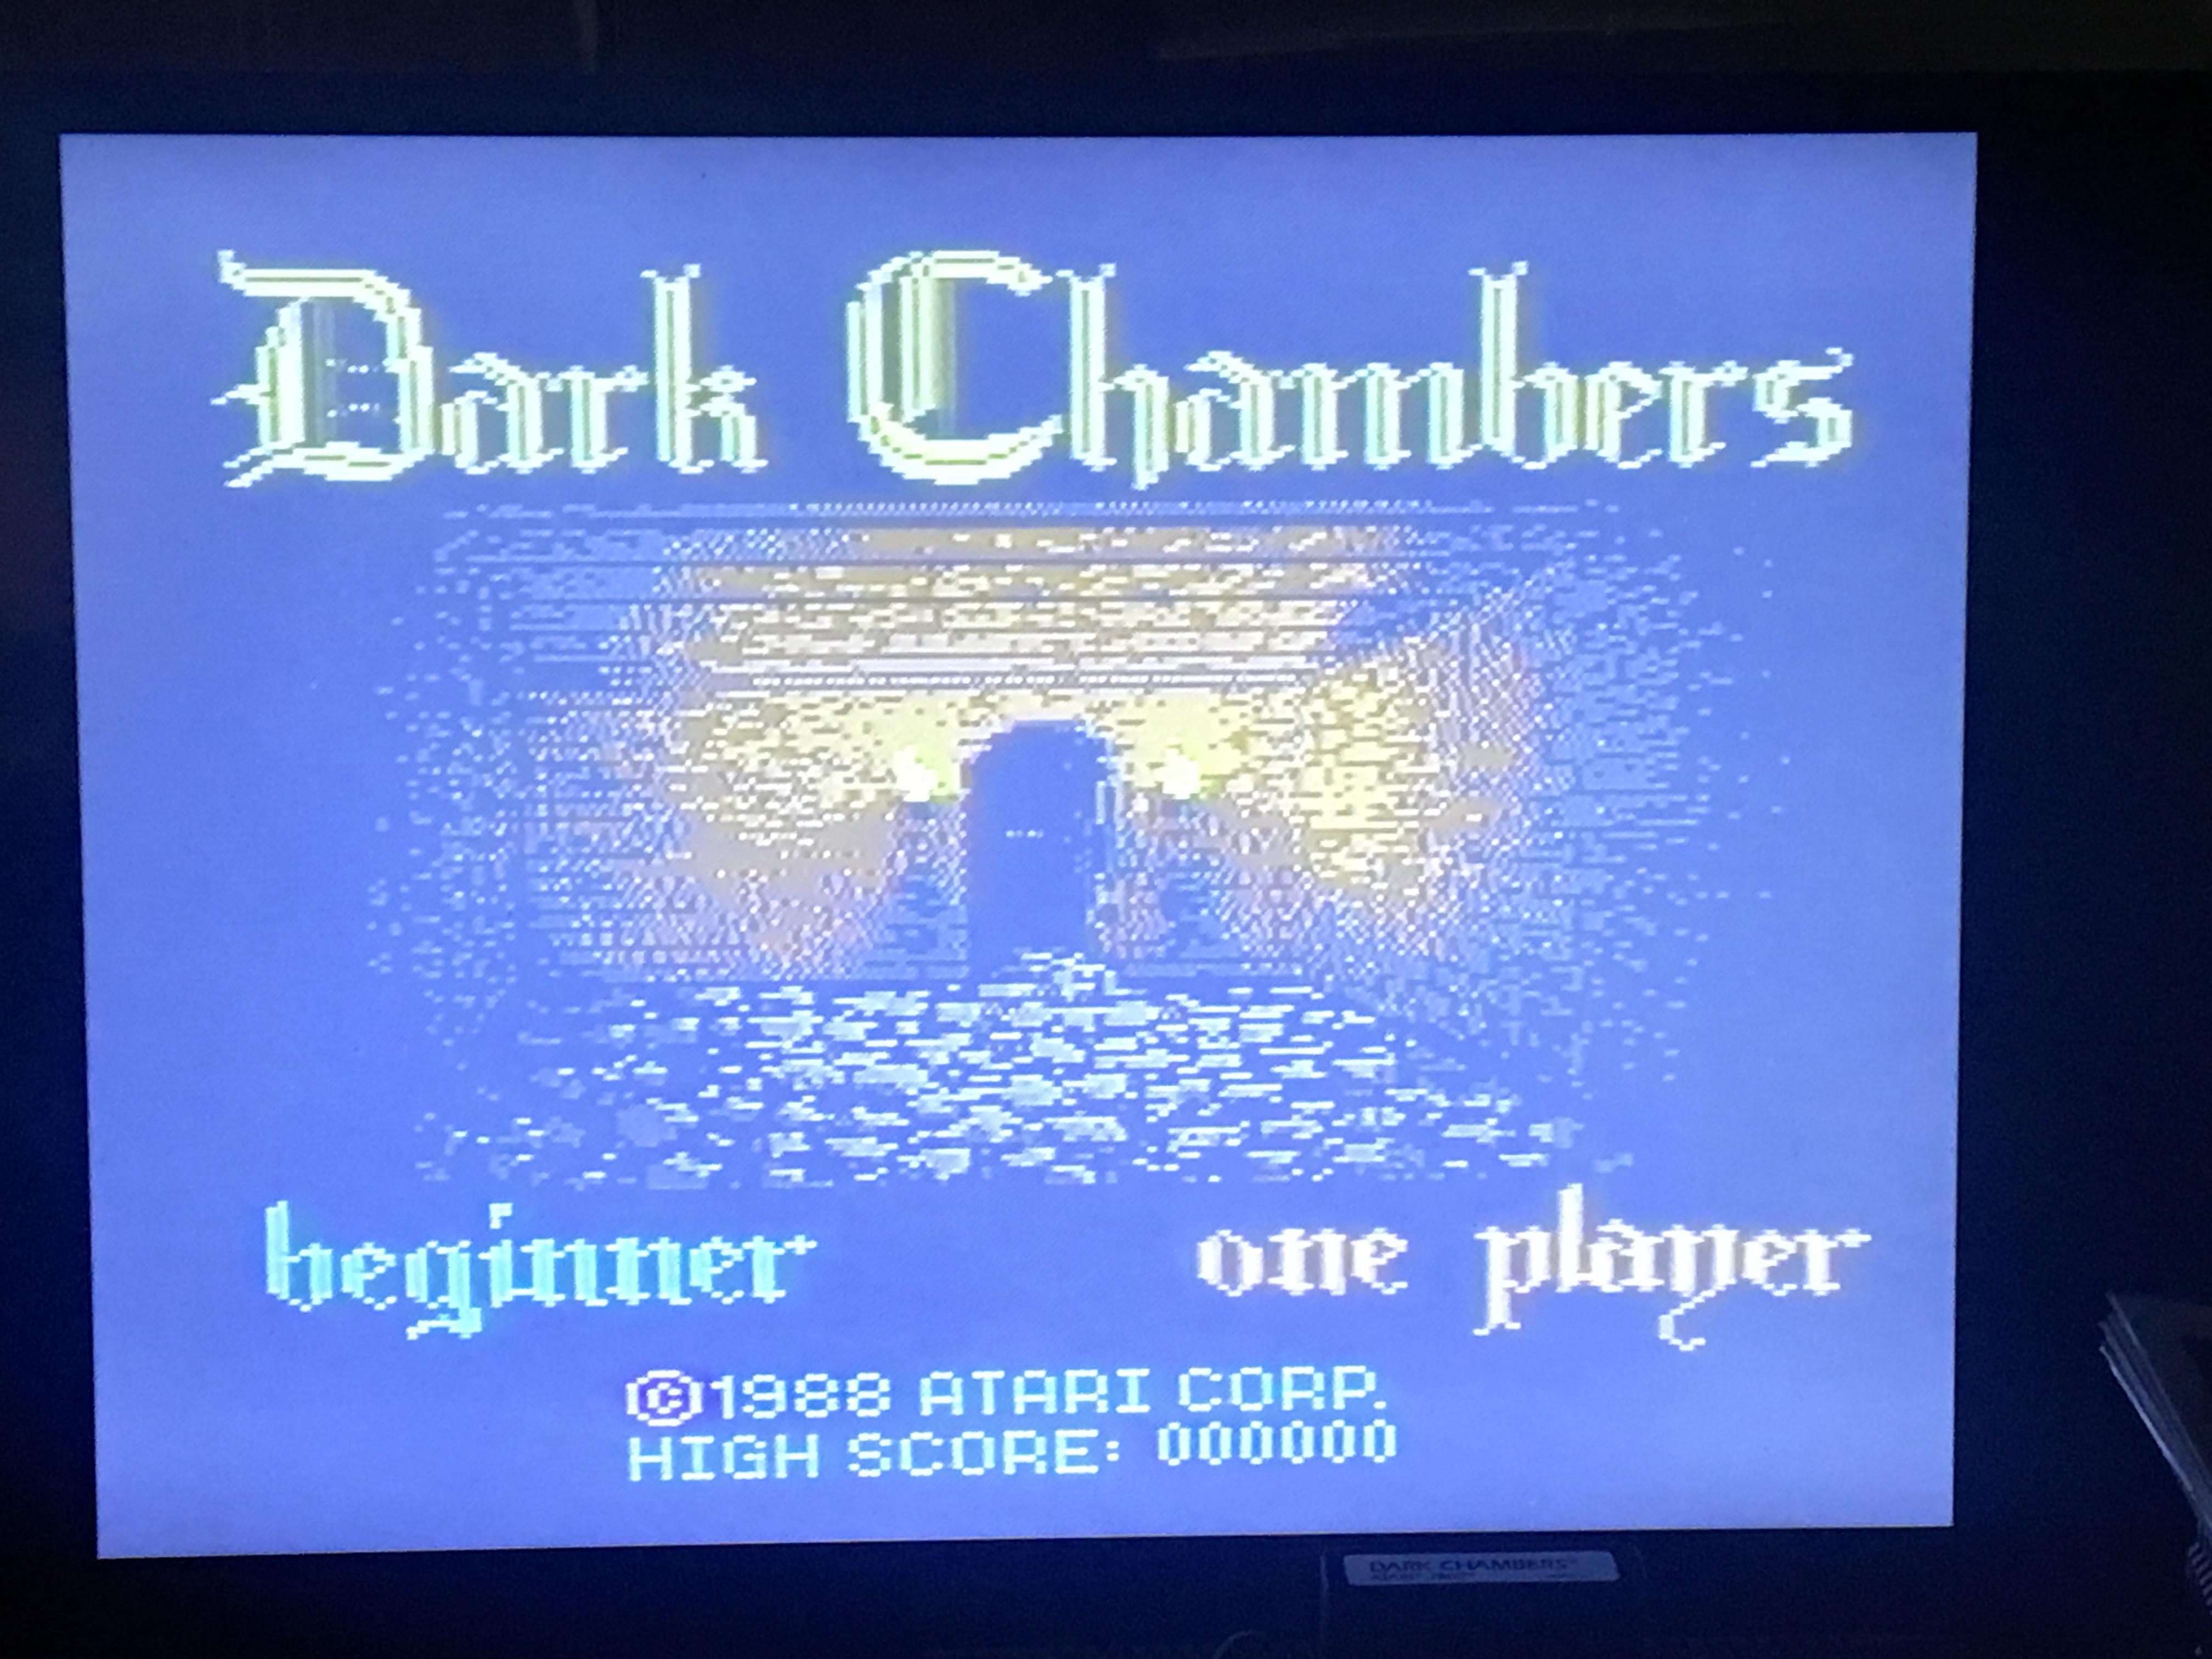 Dark Chambers: Beginner 675,000 points